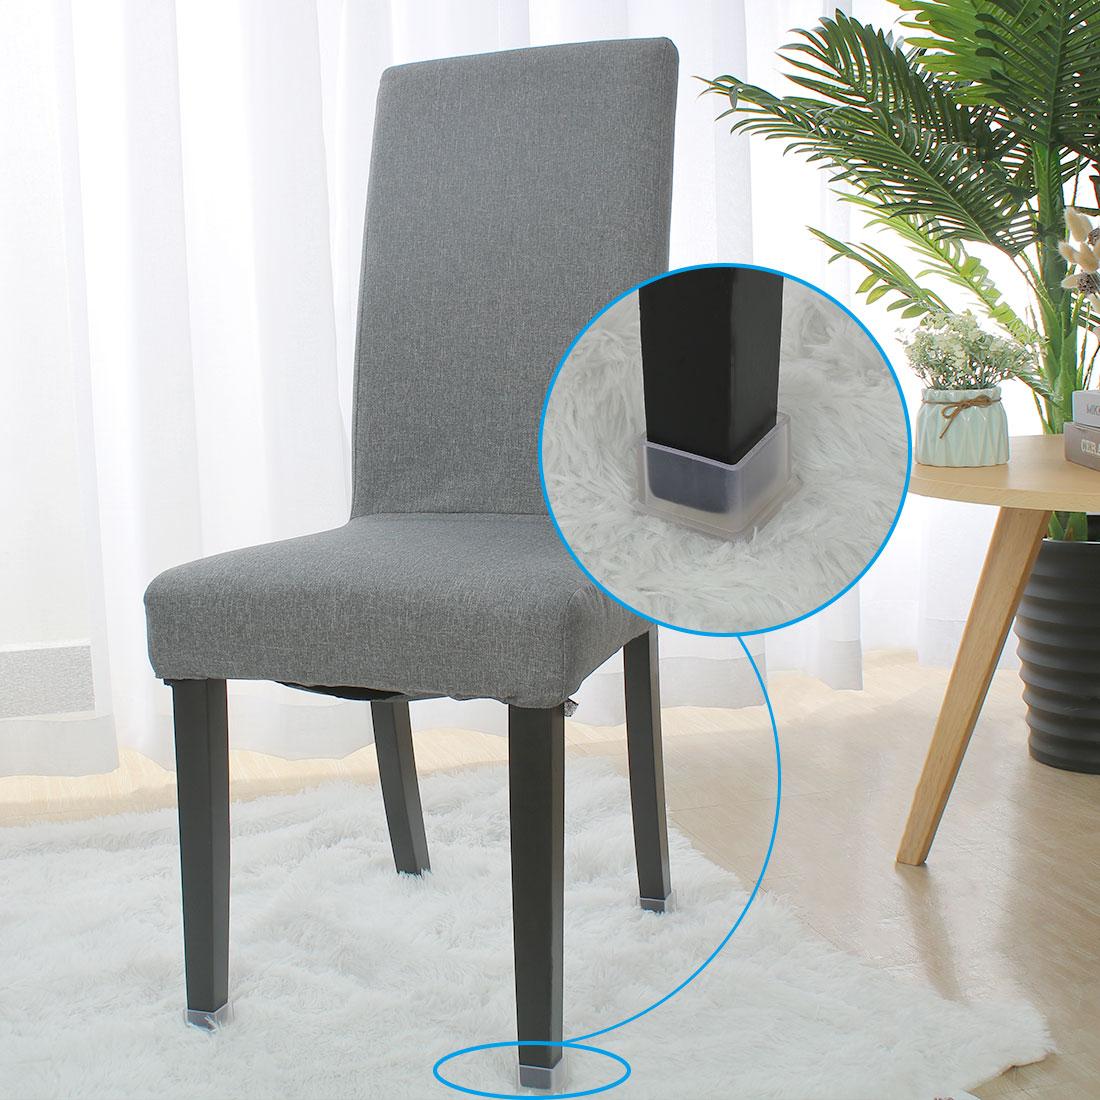 "Clear Chair Leg Caps Feet Furniture Floor Protector 3pcs 1.50"" x 1.50""(38*38mm) - image 1 de 7"